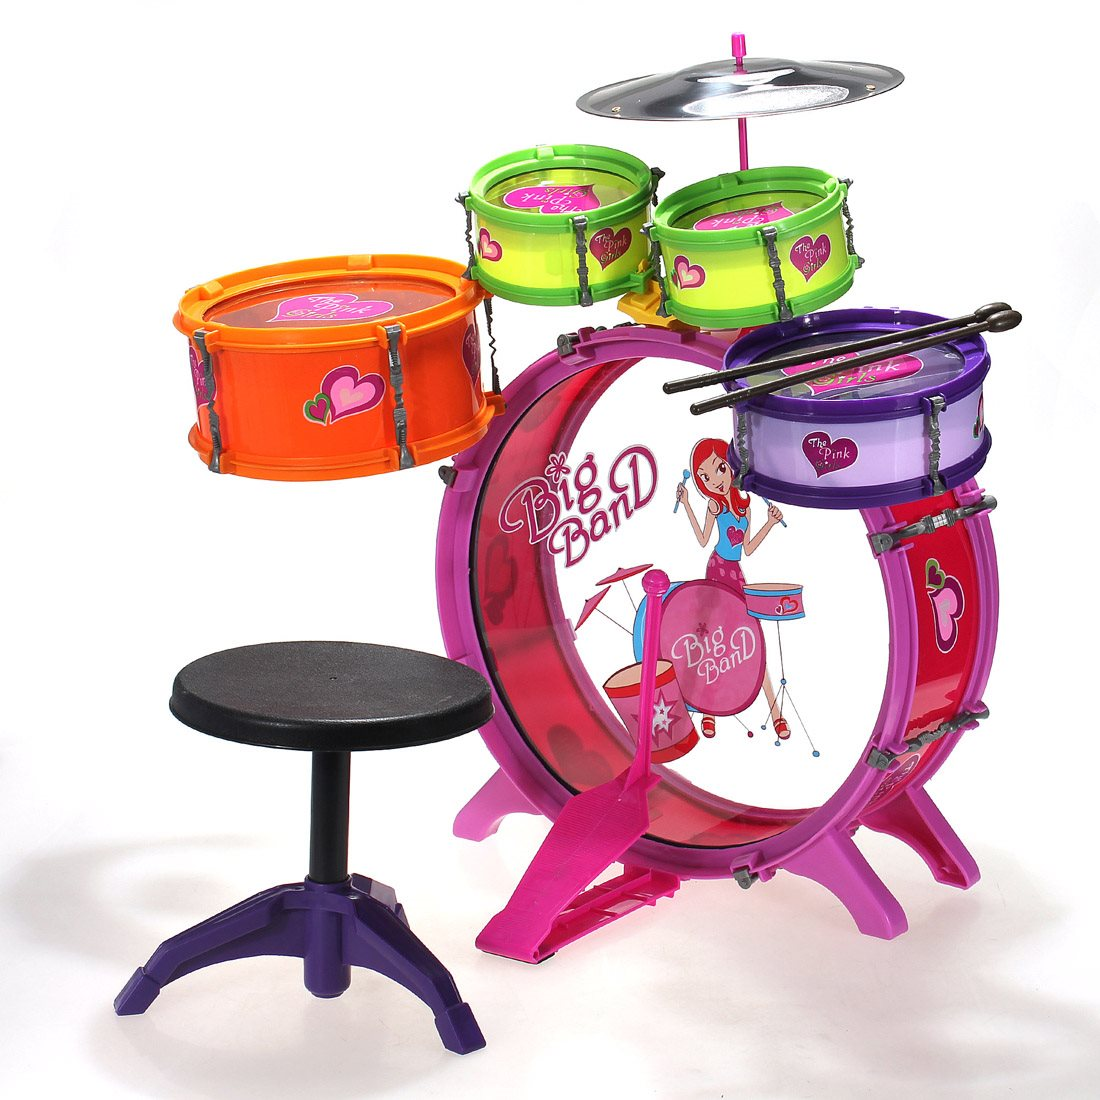 Medium Of Toddler Drum Set